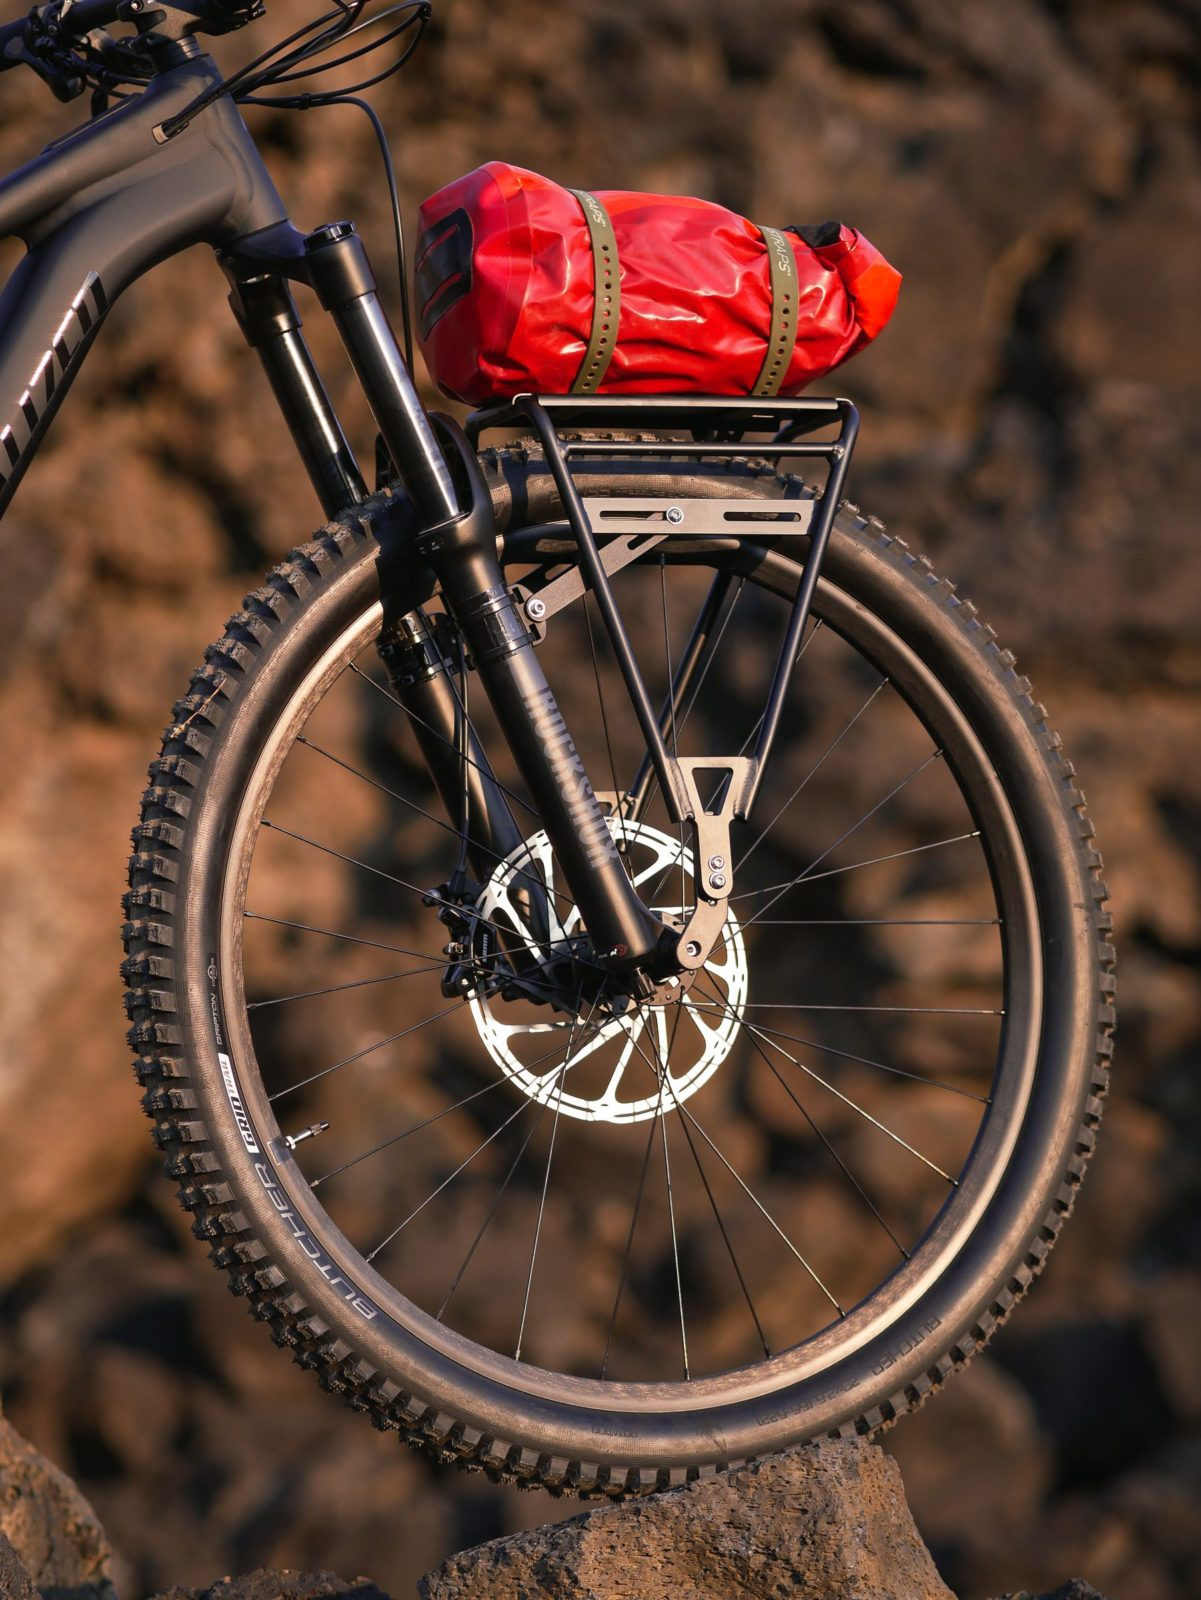 Bike Cargo rack mounted on a mountain bike fork